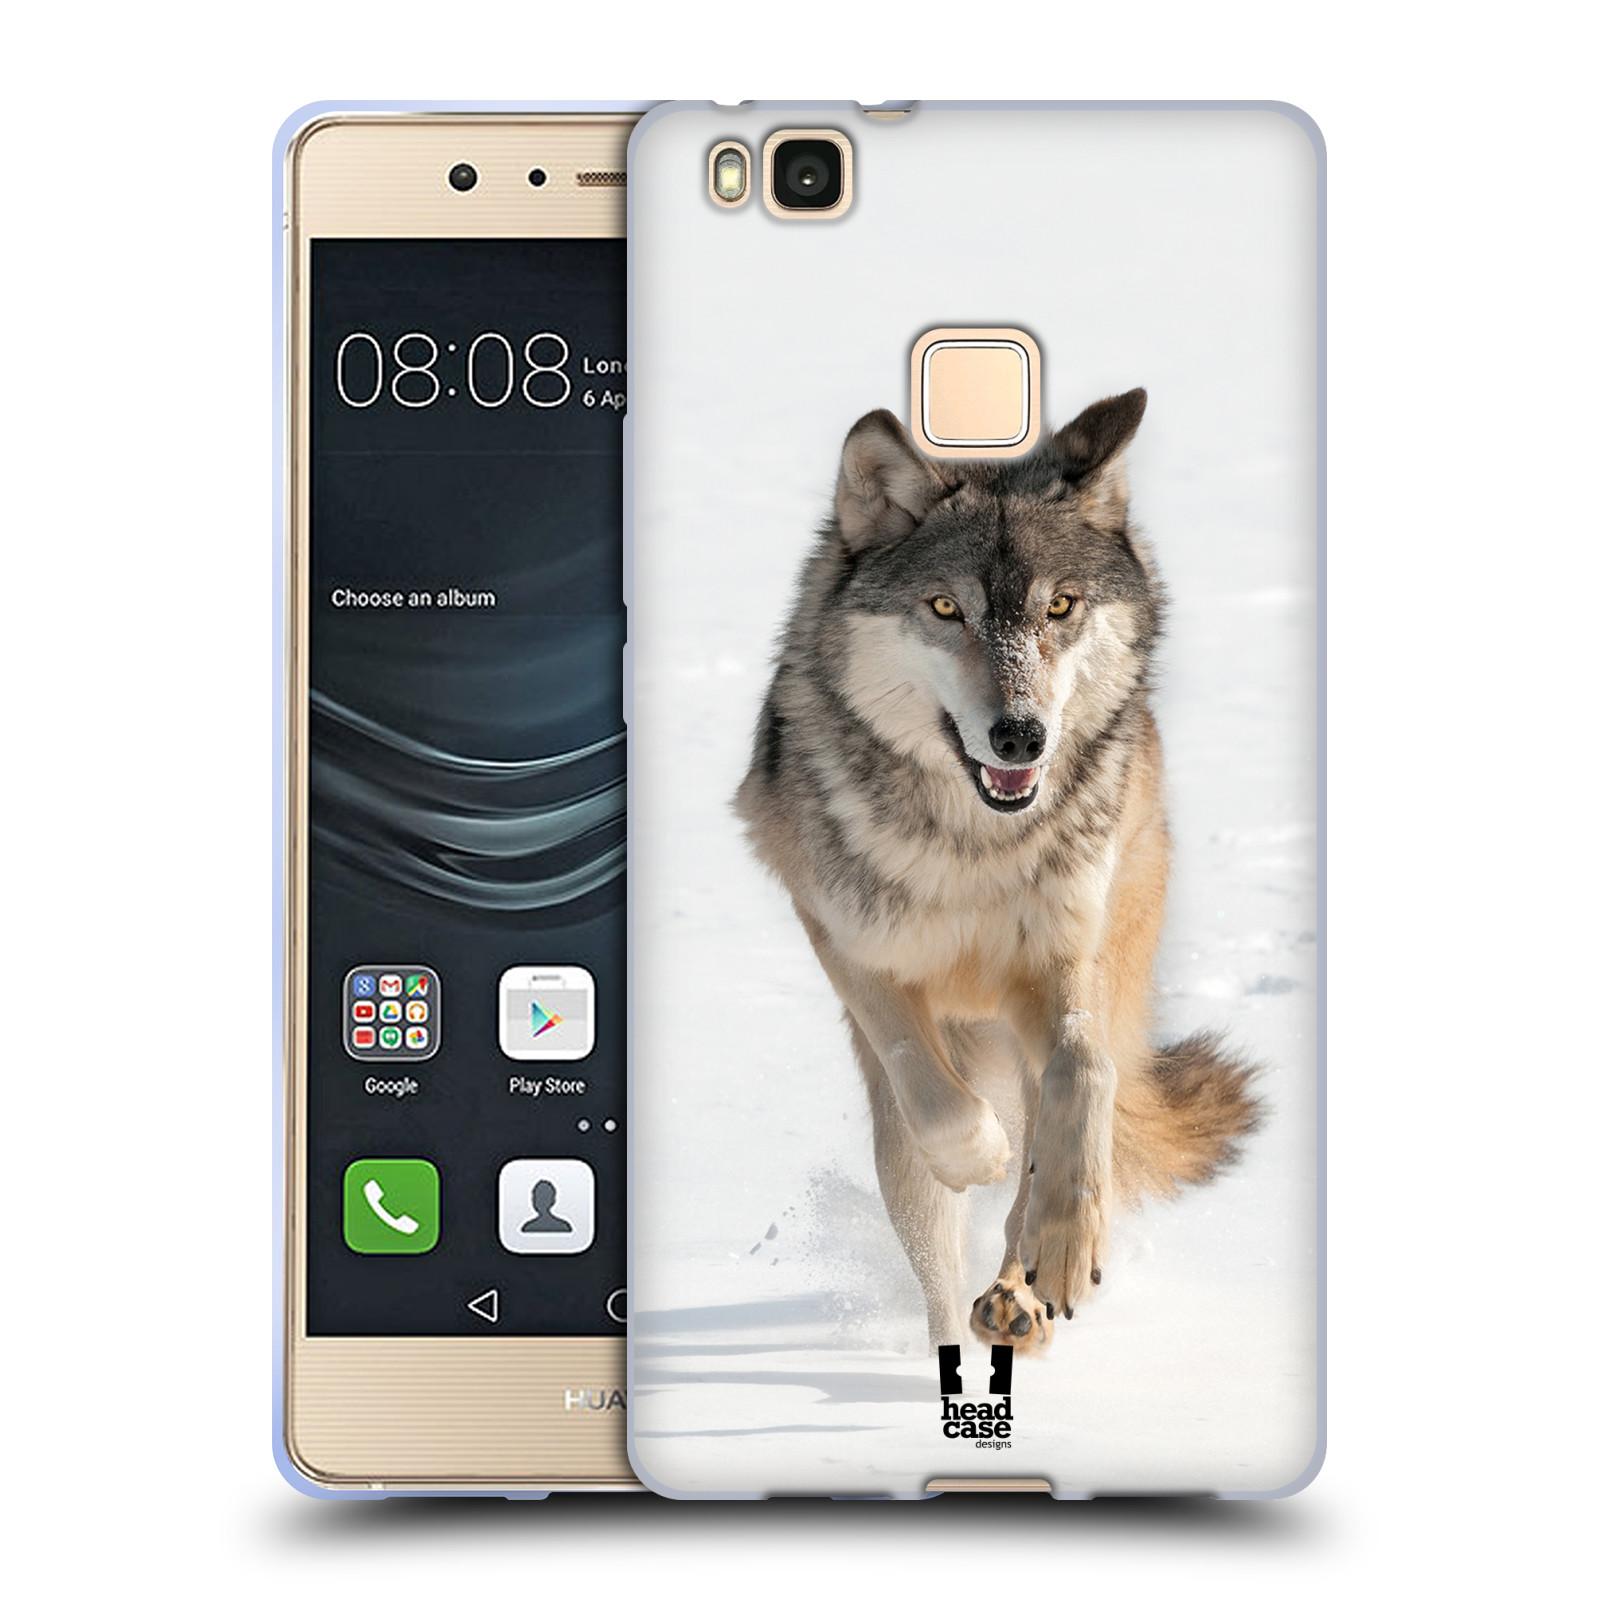 Silikonové pouzdro na mobil Huawei P9 Lite - Head Case - DIVOČINA – VLK (Silikonový kryt či obal na mobilní telefon Huawei P9 Lite z roku 2016 s motivem DIVOČINA – VLK)